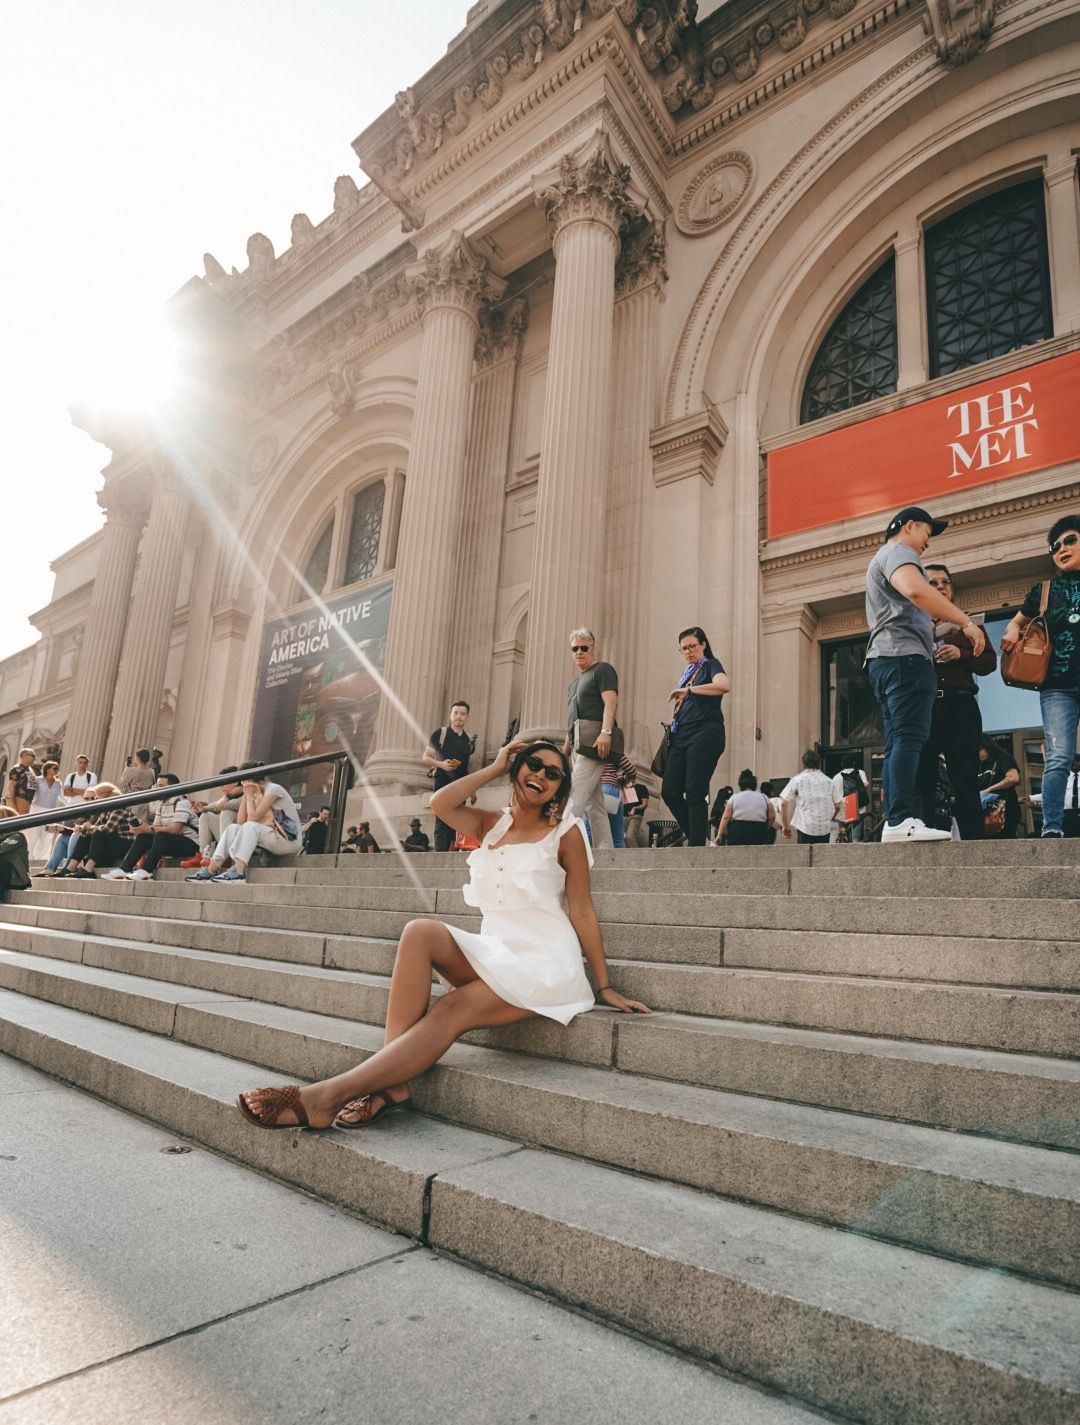 Gossip Girl // The Met // Picture Ideas Travel pictures